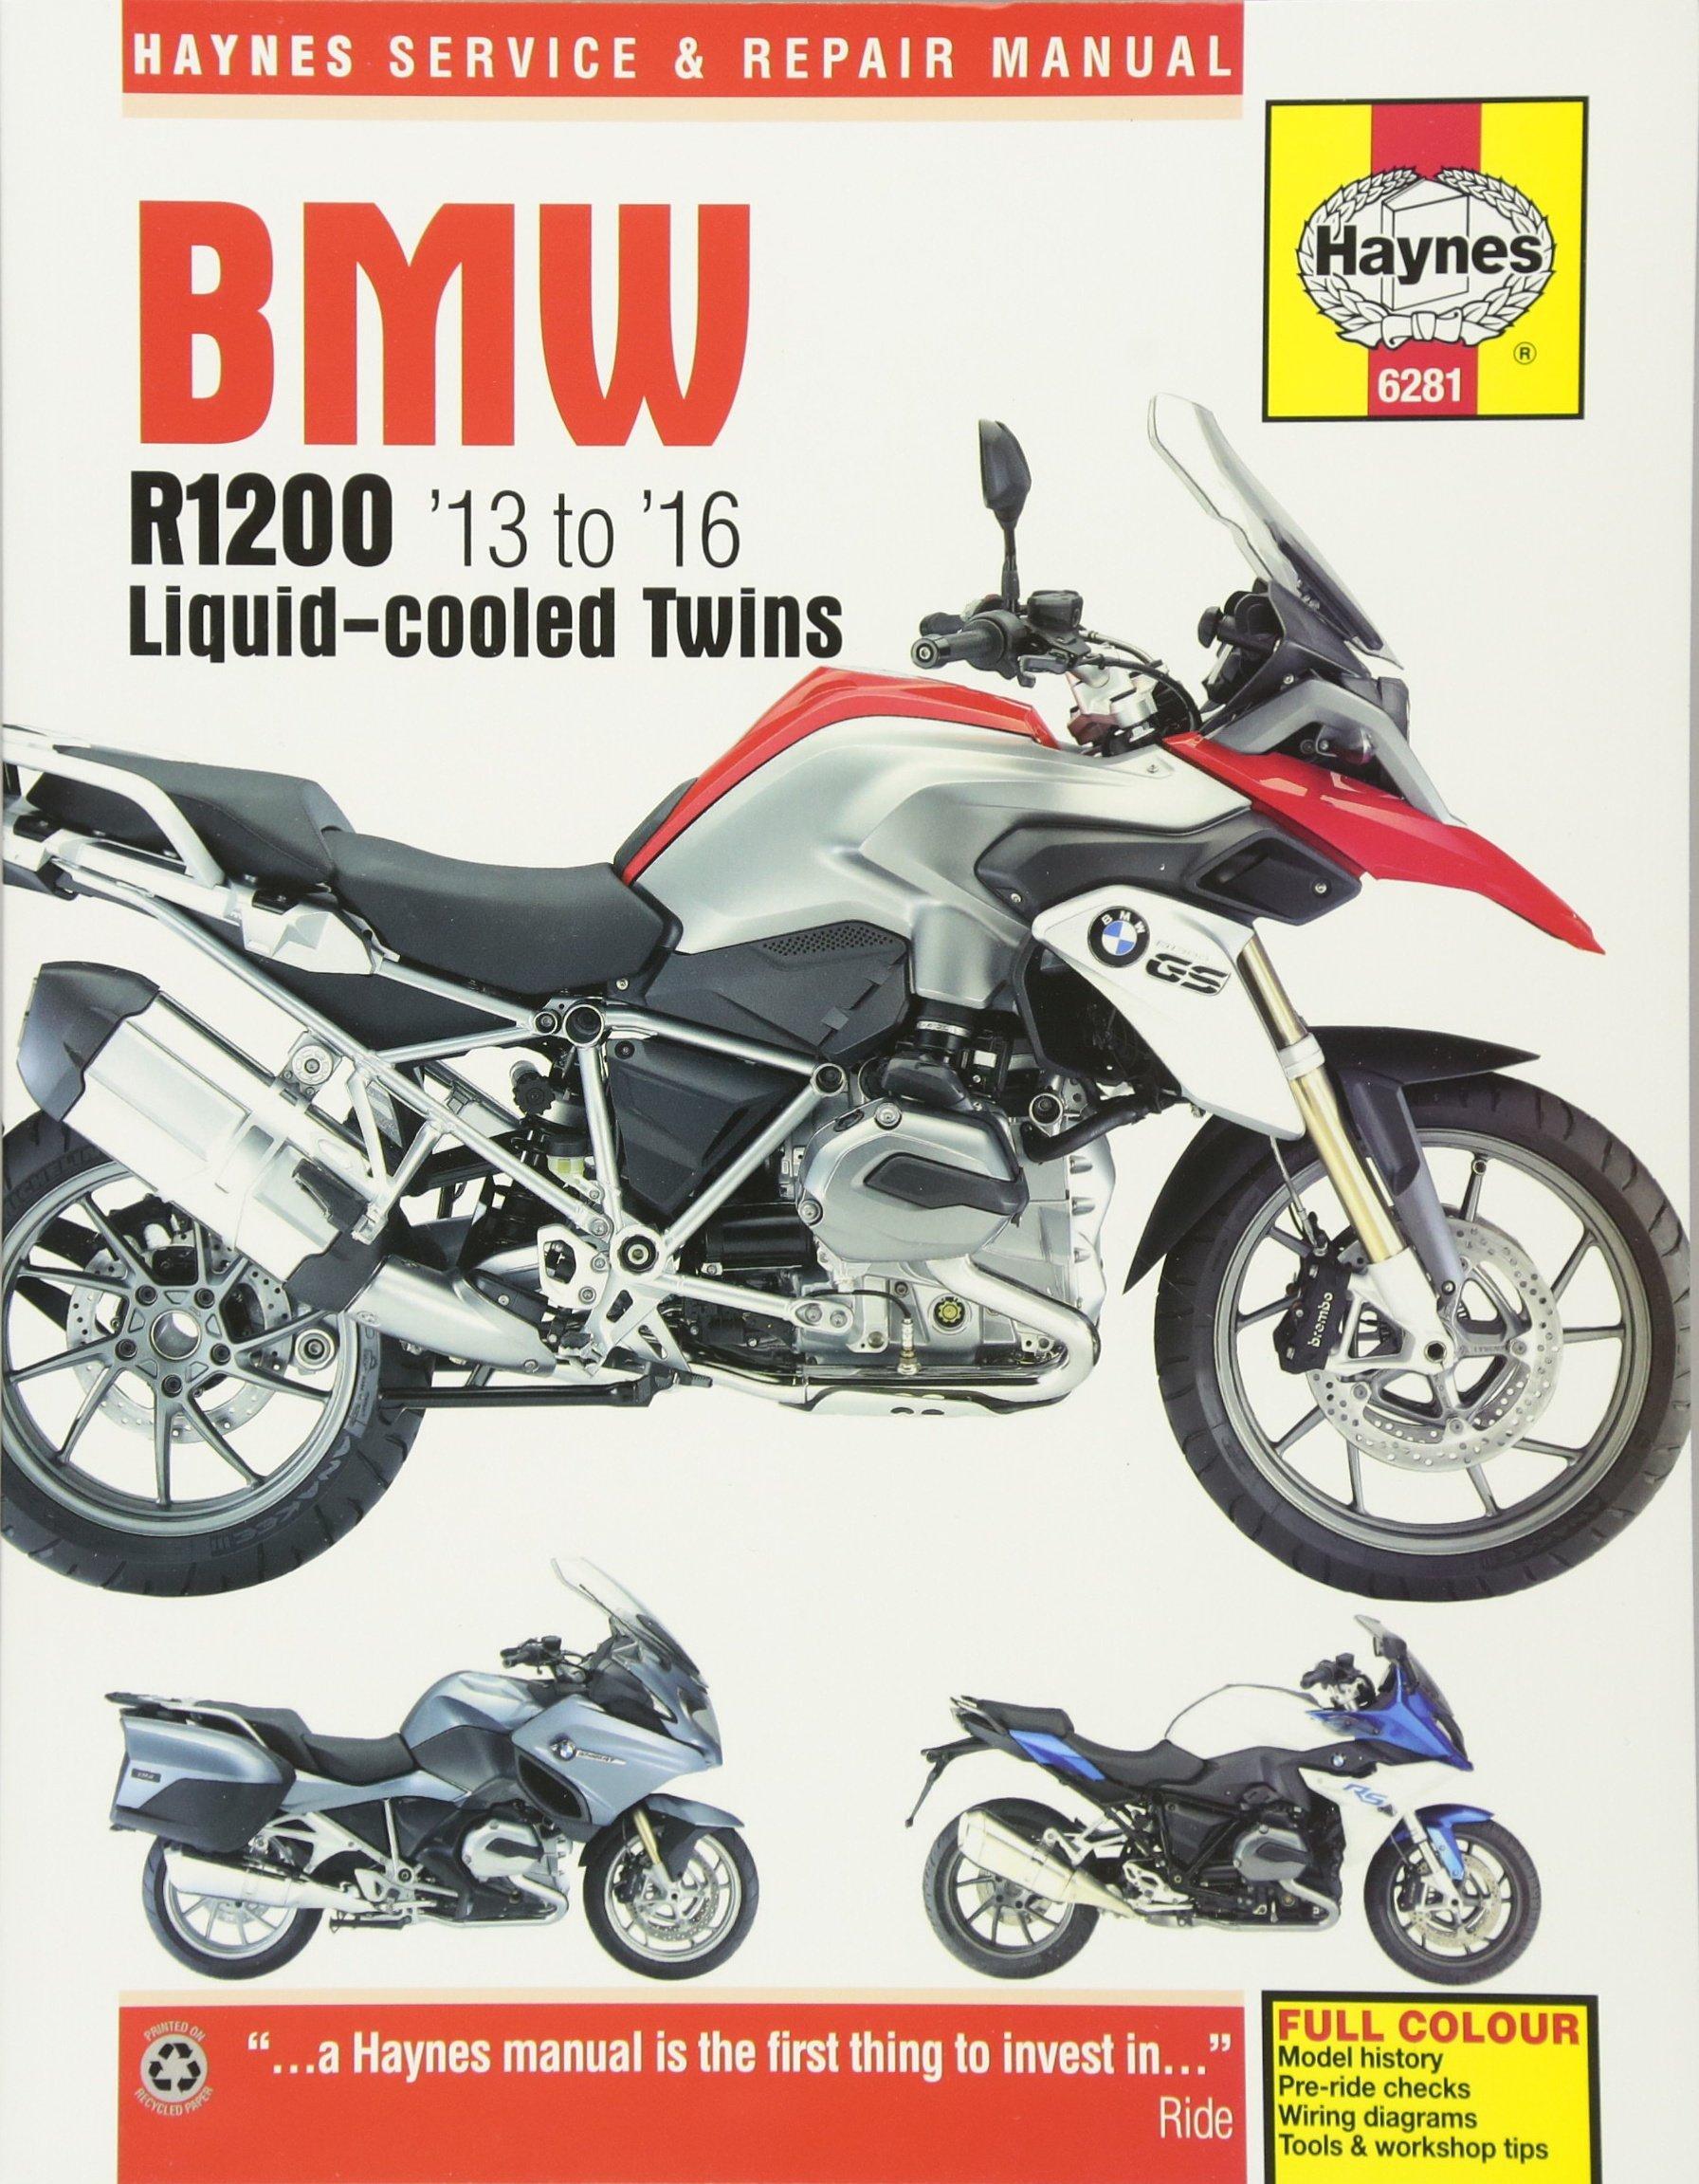 BMW R1200 '13 to '16 Liquid-cooled Twins (Haynes Service & Repair Manual):  Editors of Haynes Manuals: 5060385961919: Amazon.com: Books